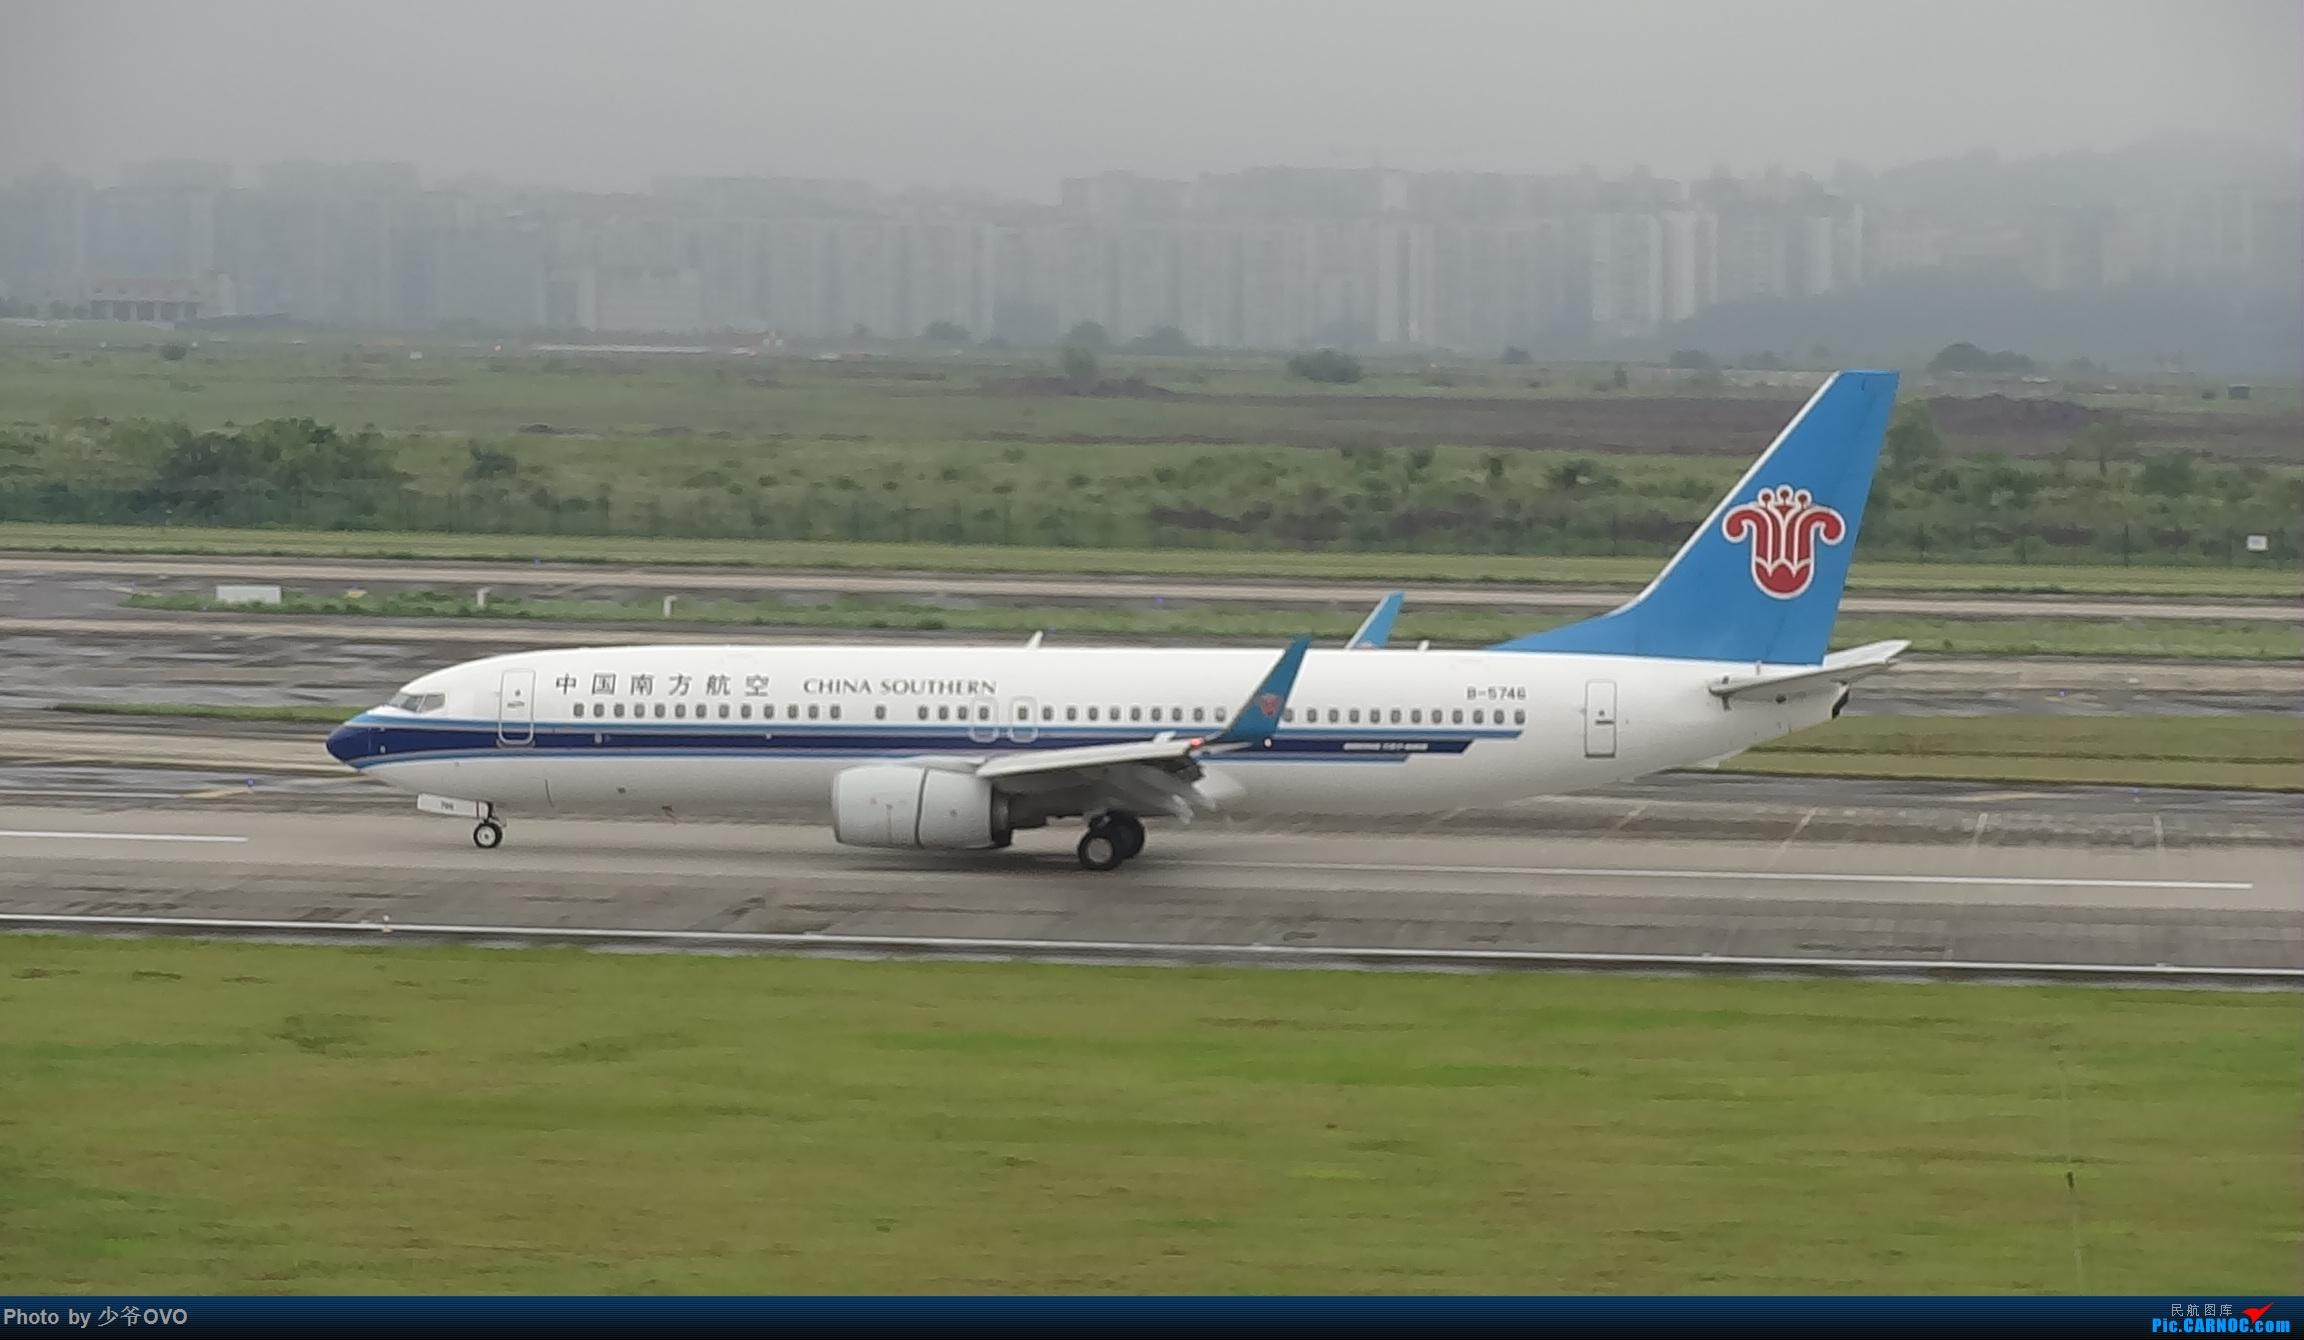 Re:[原创]CKG重庆江北机场拍机 ,中法建交50周年 BOEING 737-800 B-5746 中国重庆江北国际机场